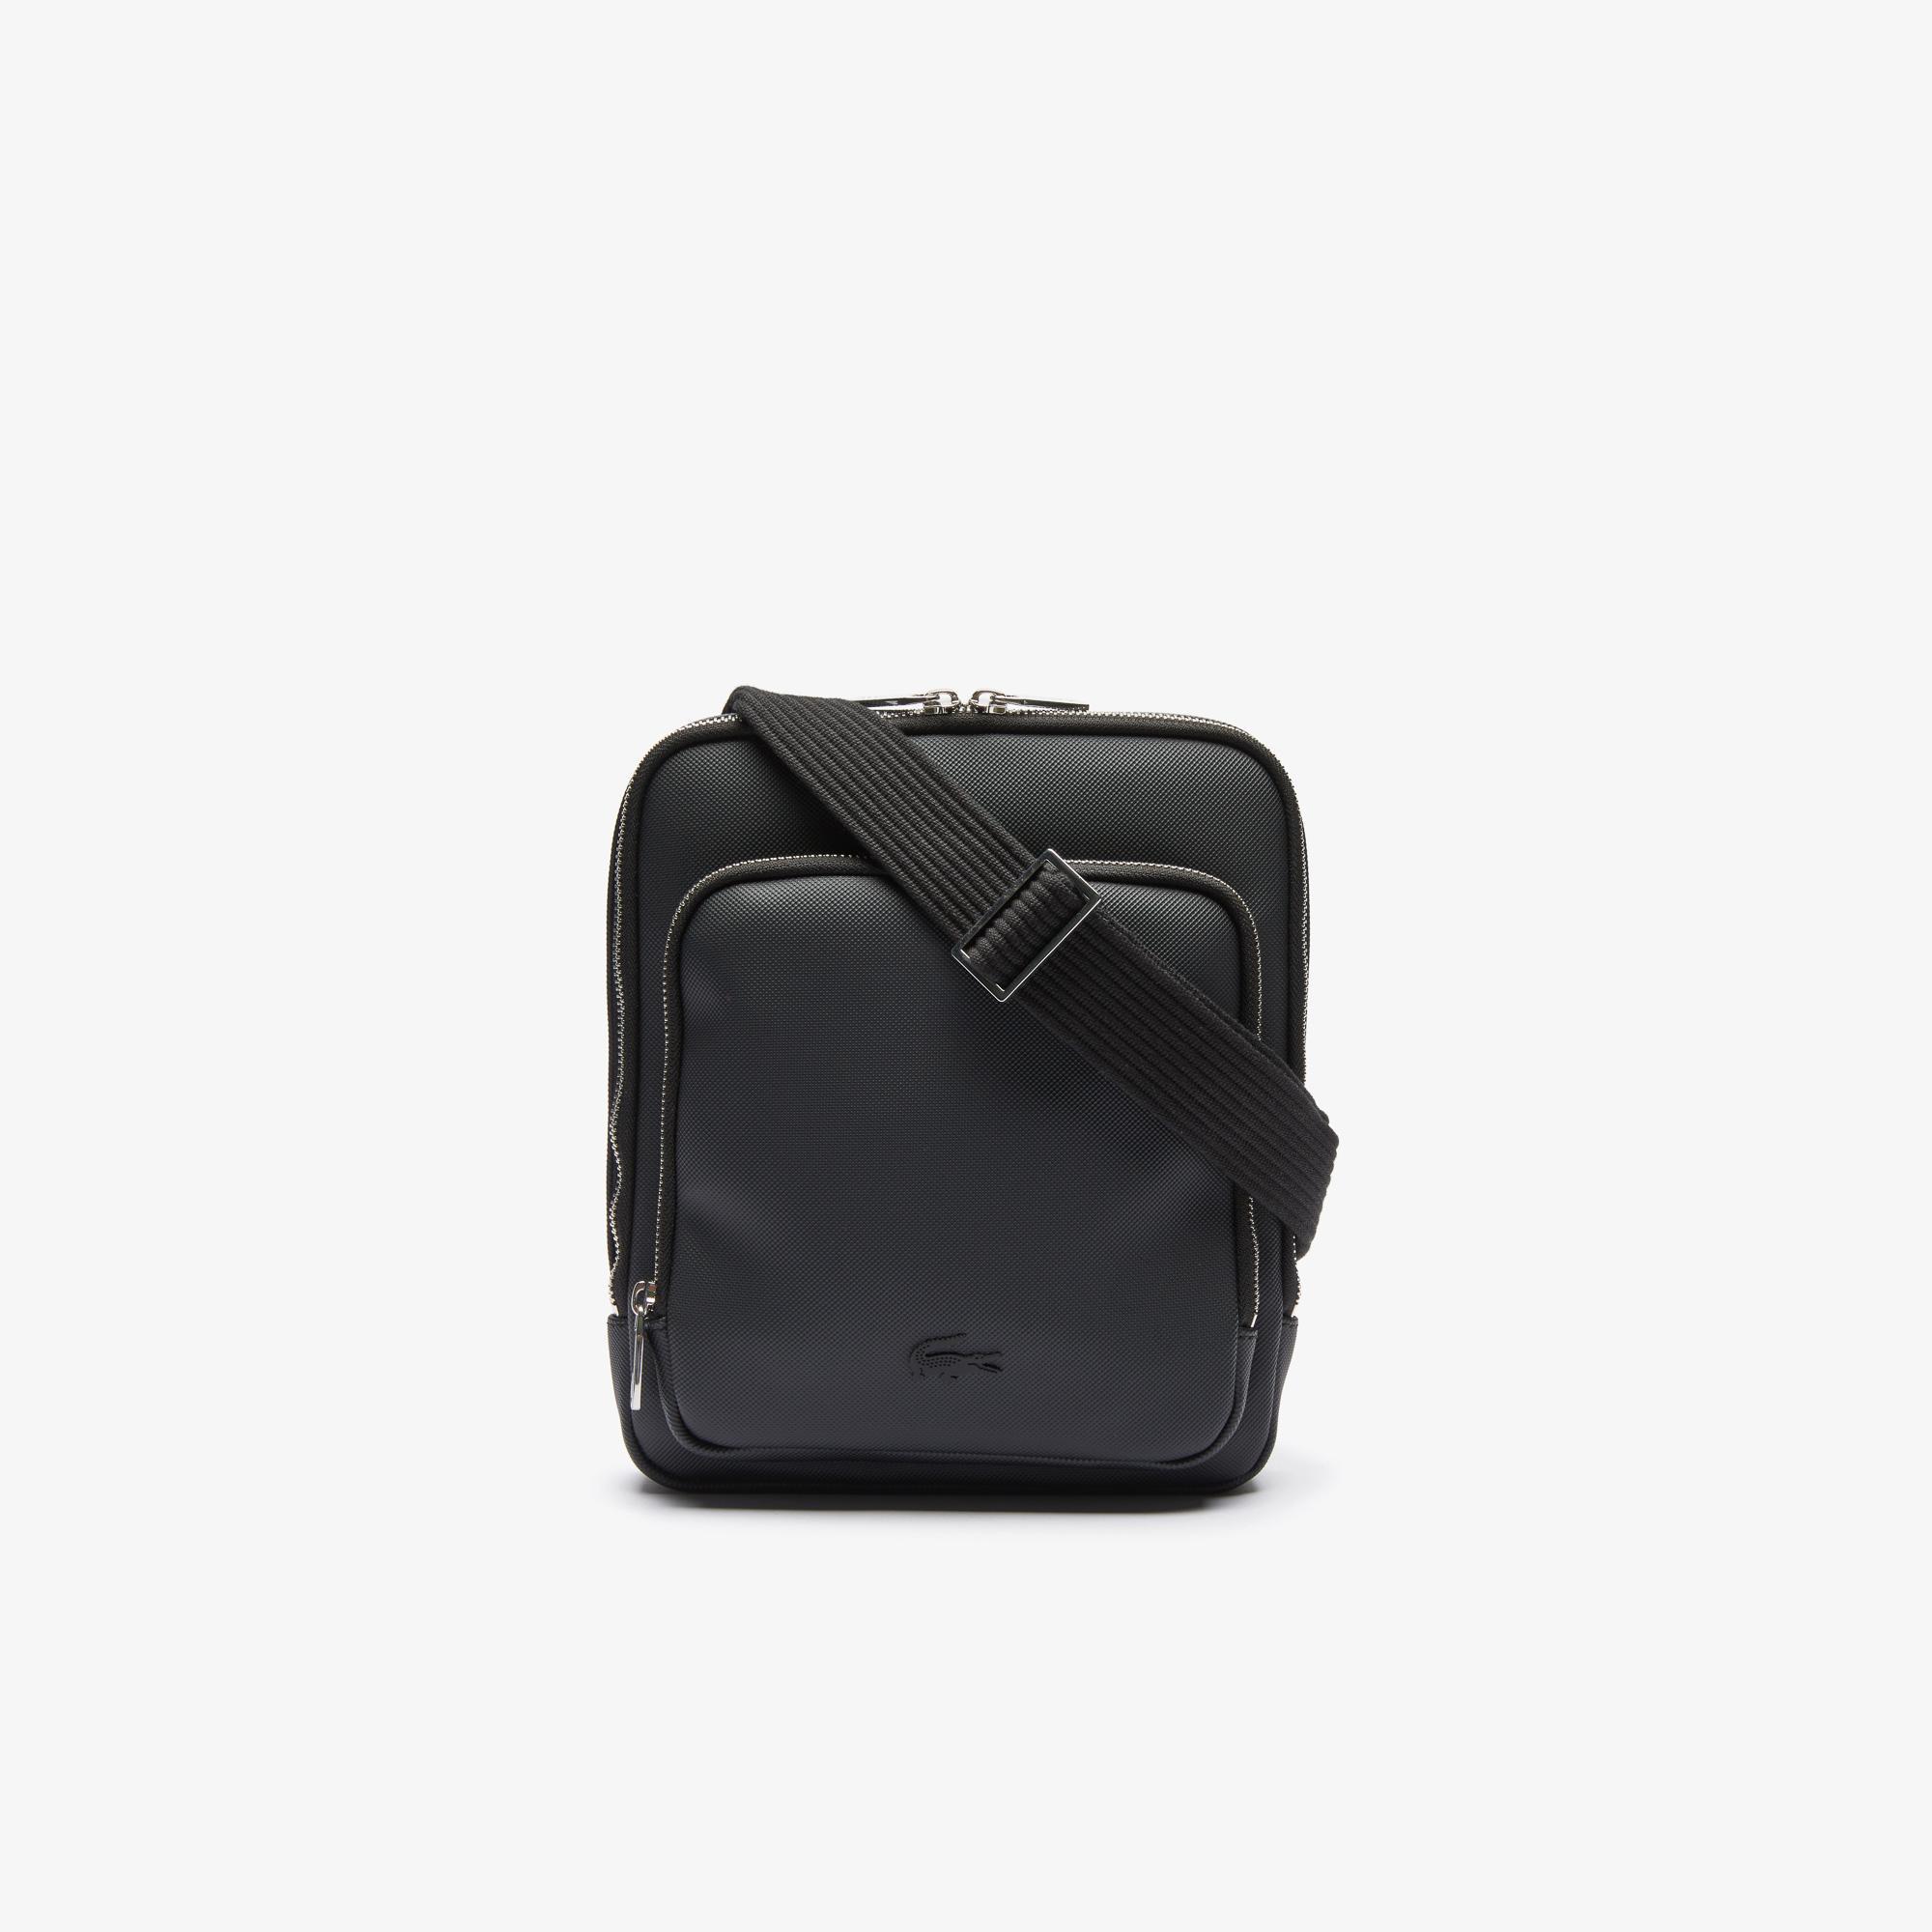 Lacoste Men's Classic Zippered Pocket Rectangular Crossbody Bag